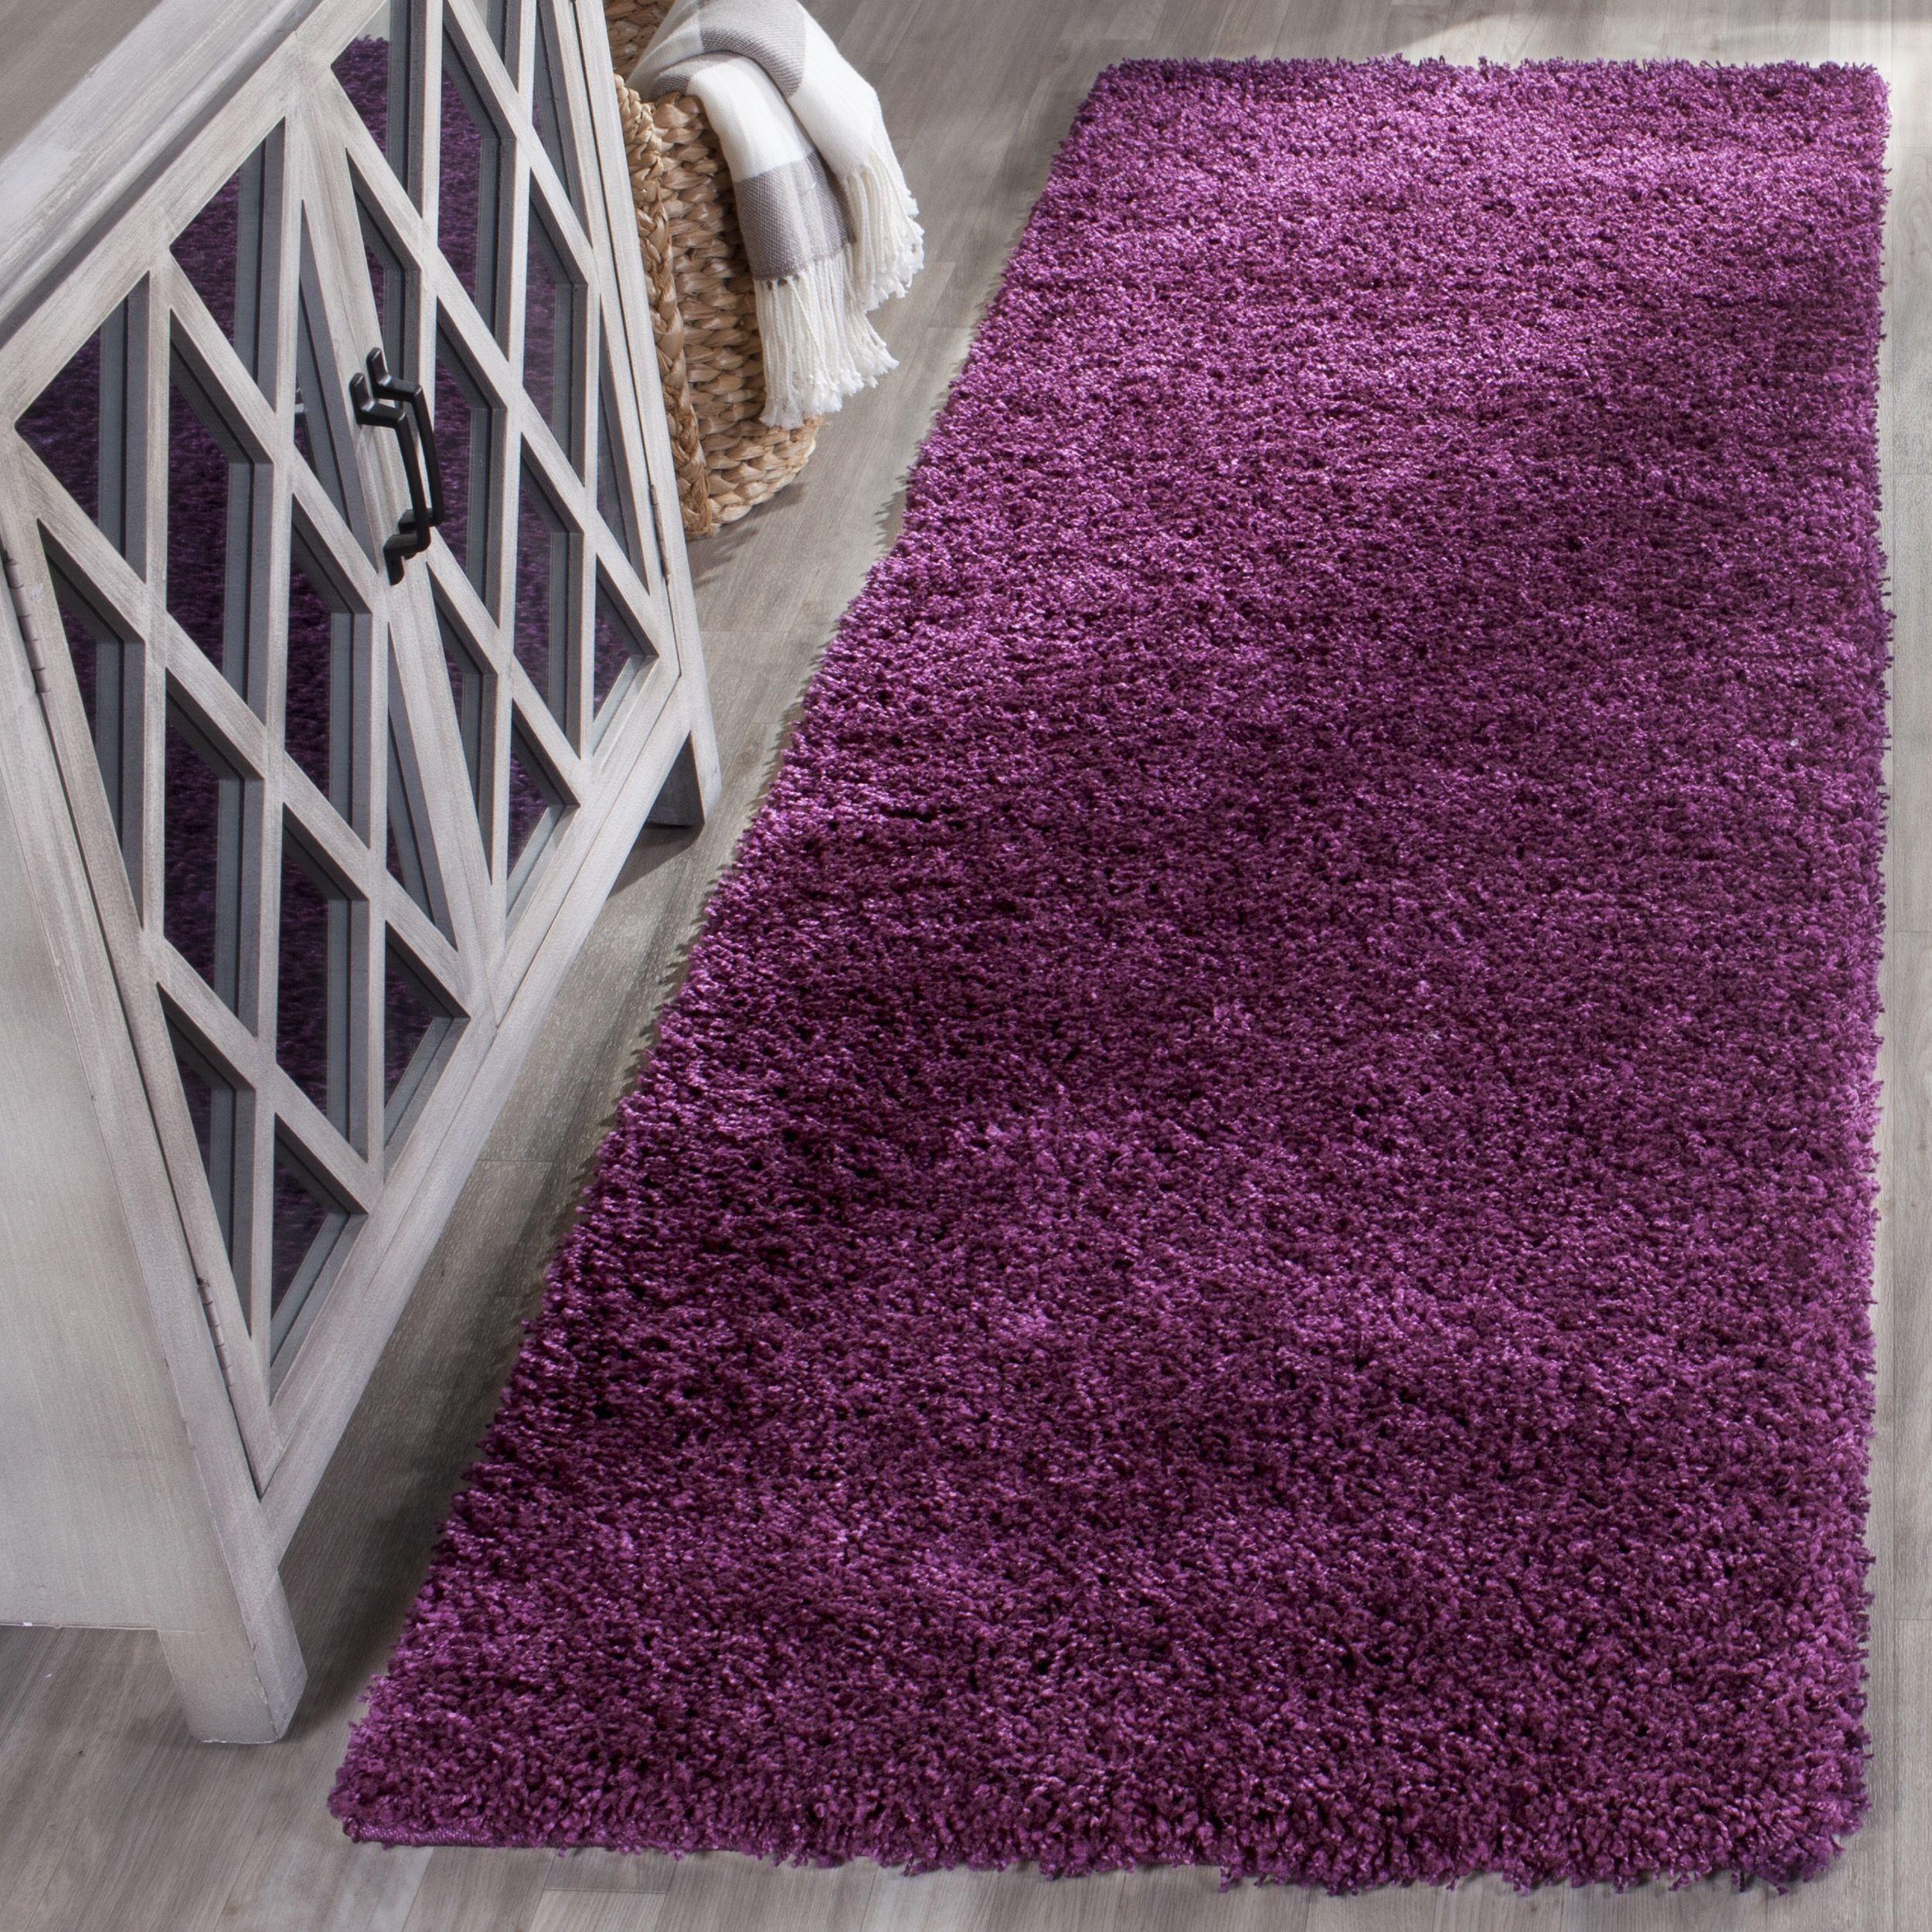 house of hampton ampthill shag purple area rug rug size runner x